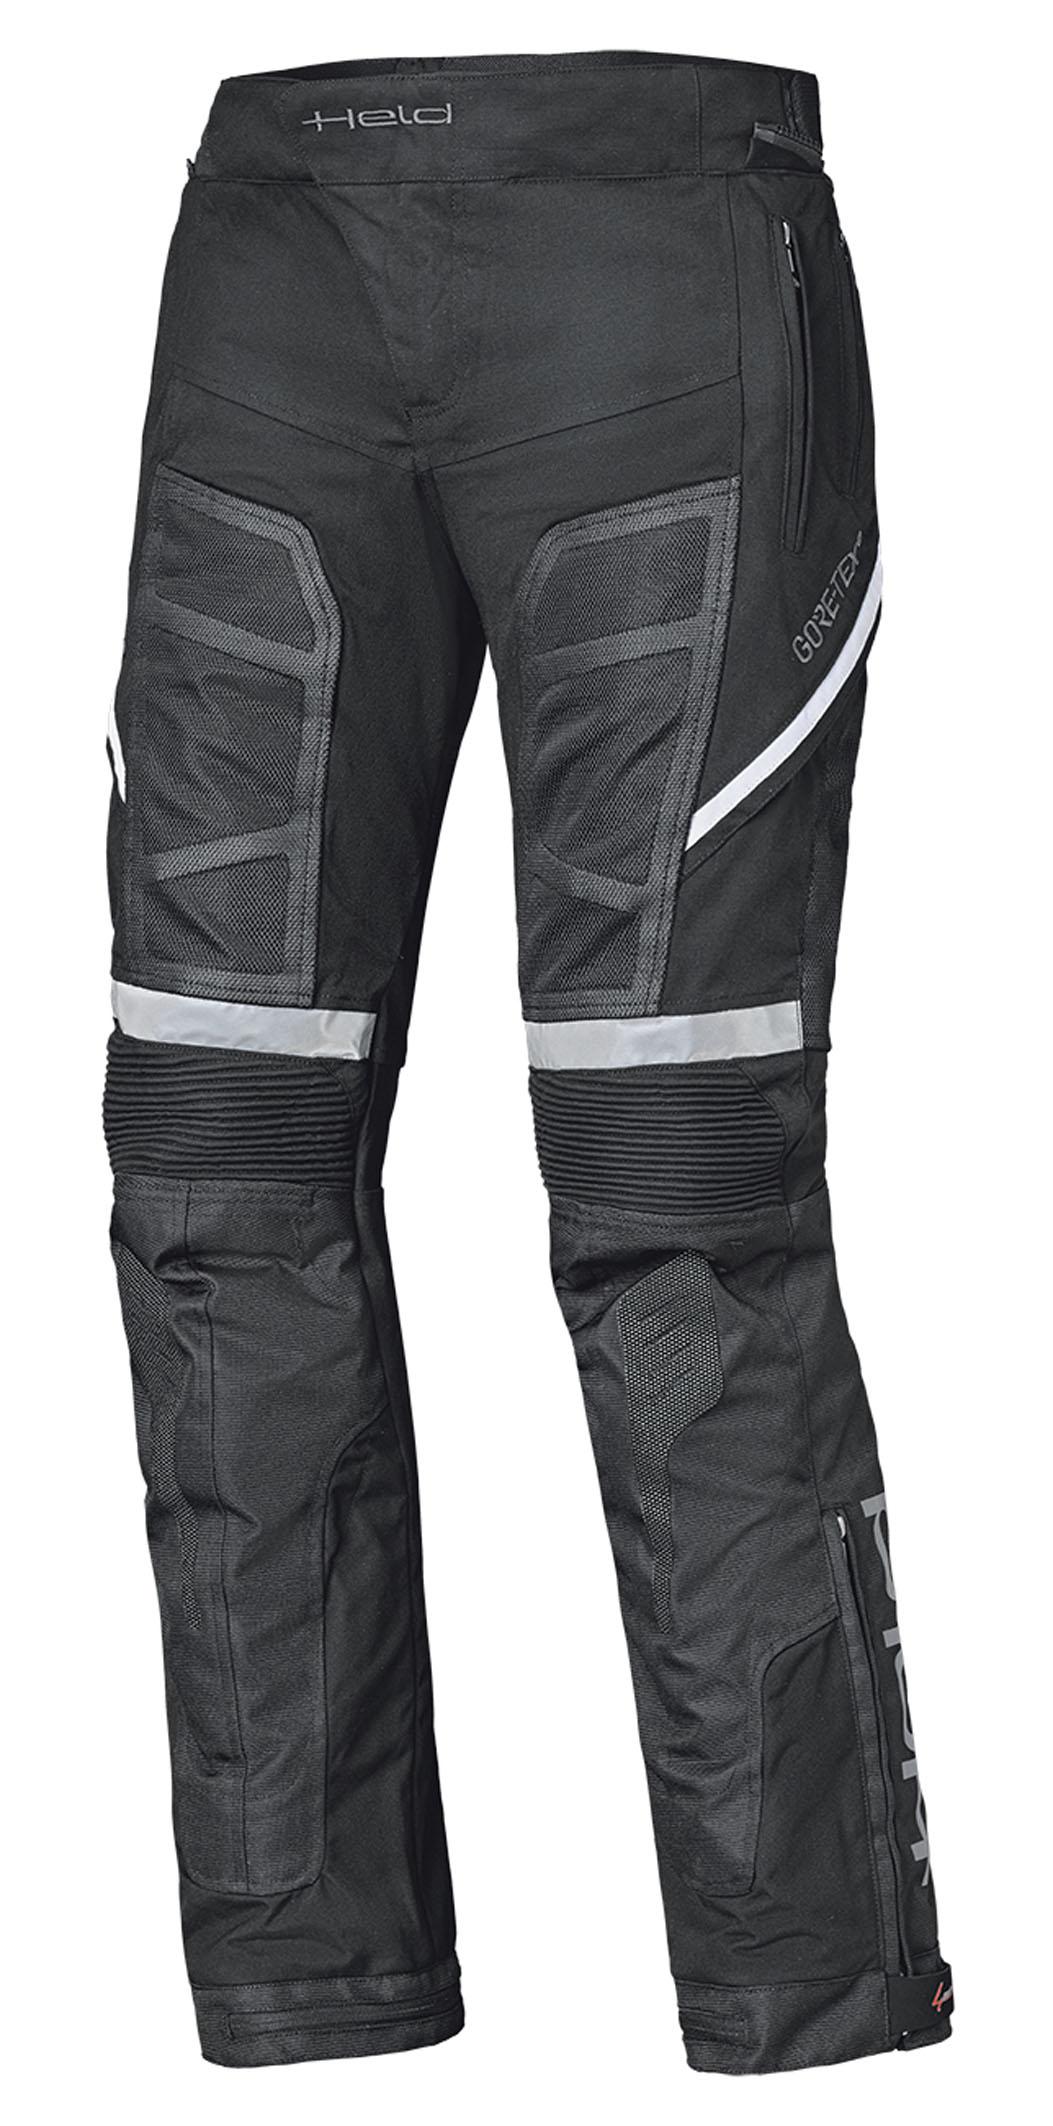 HELD - Pantalone AEROSEC GTX BASE (Nero-Bianco)(Art.6888)-1